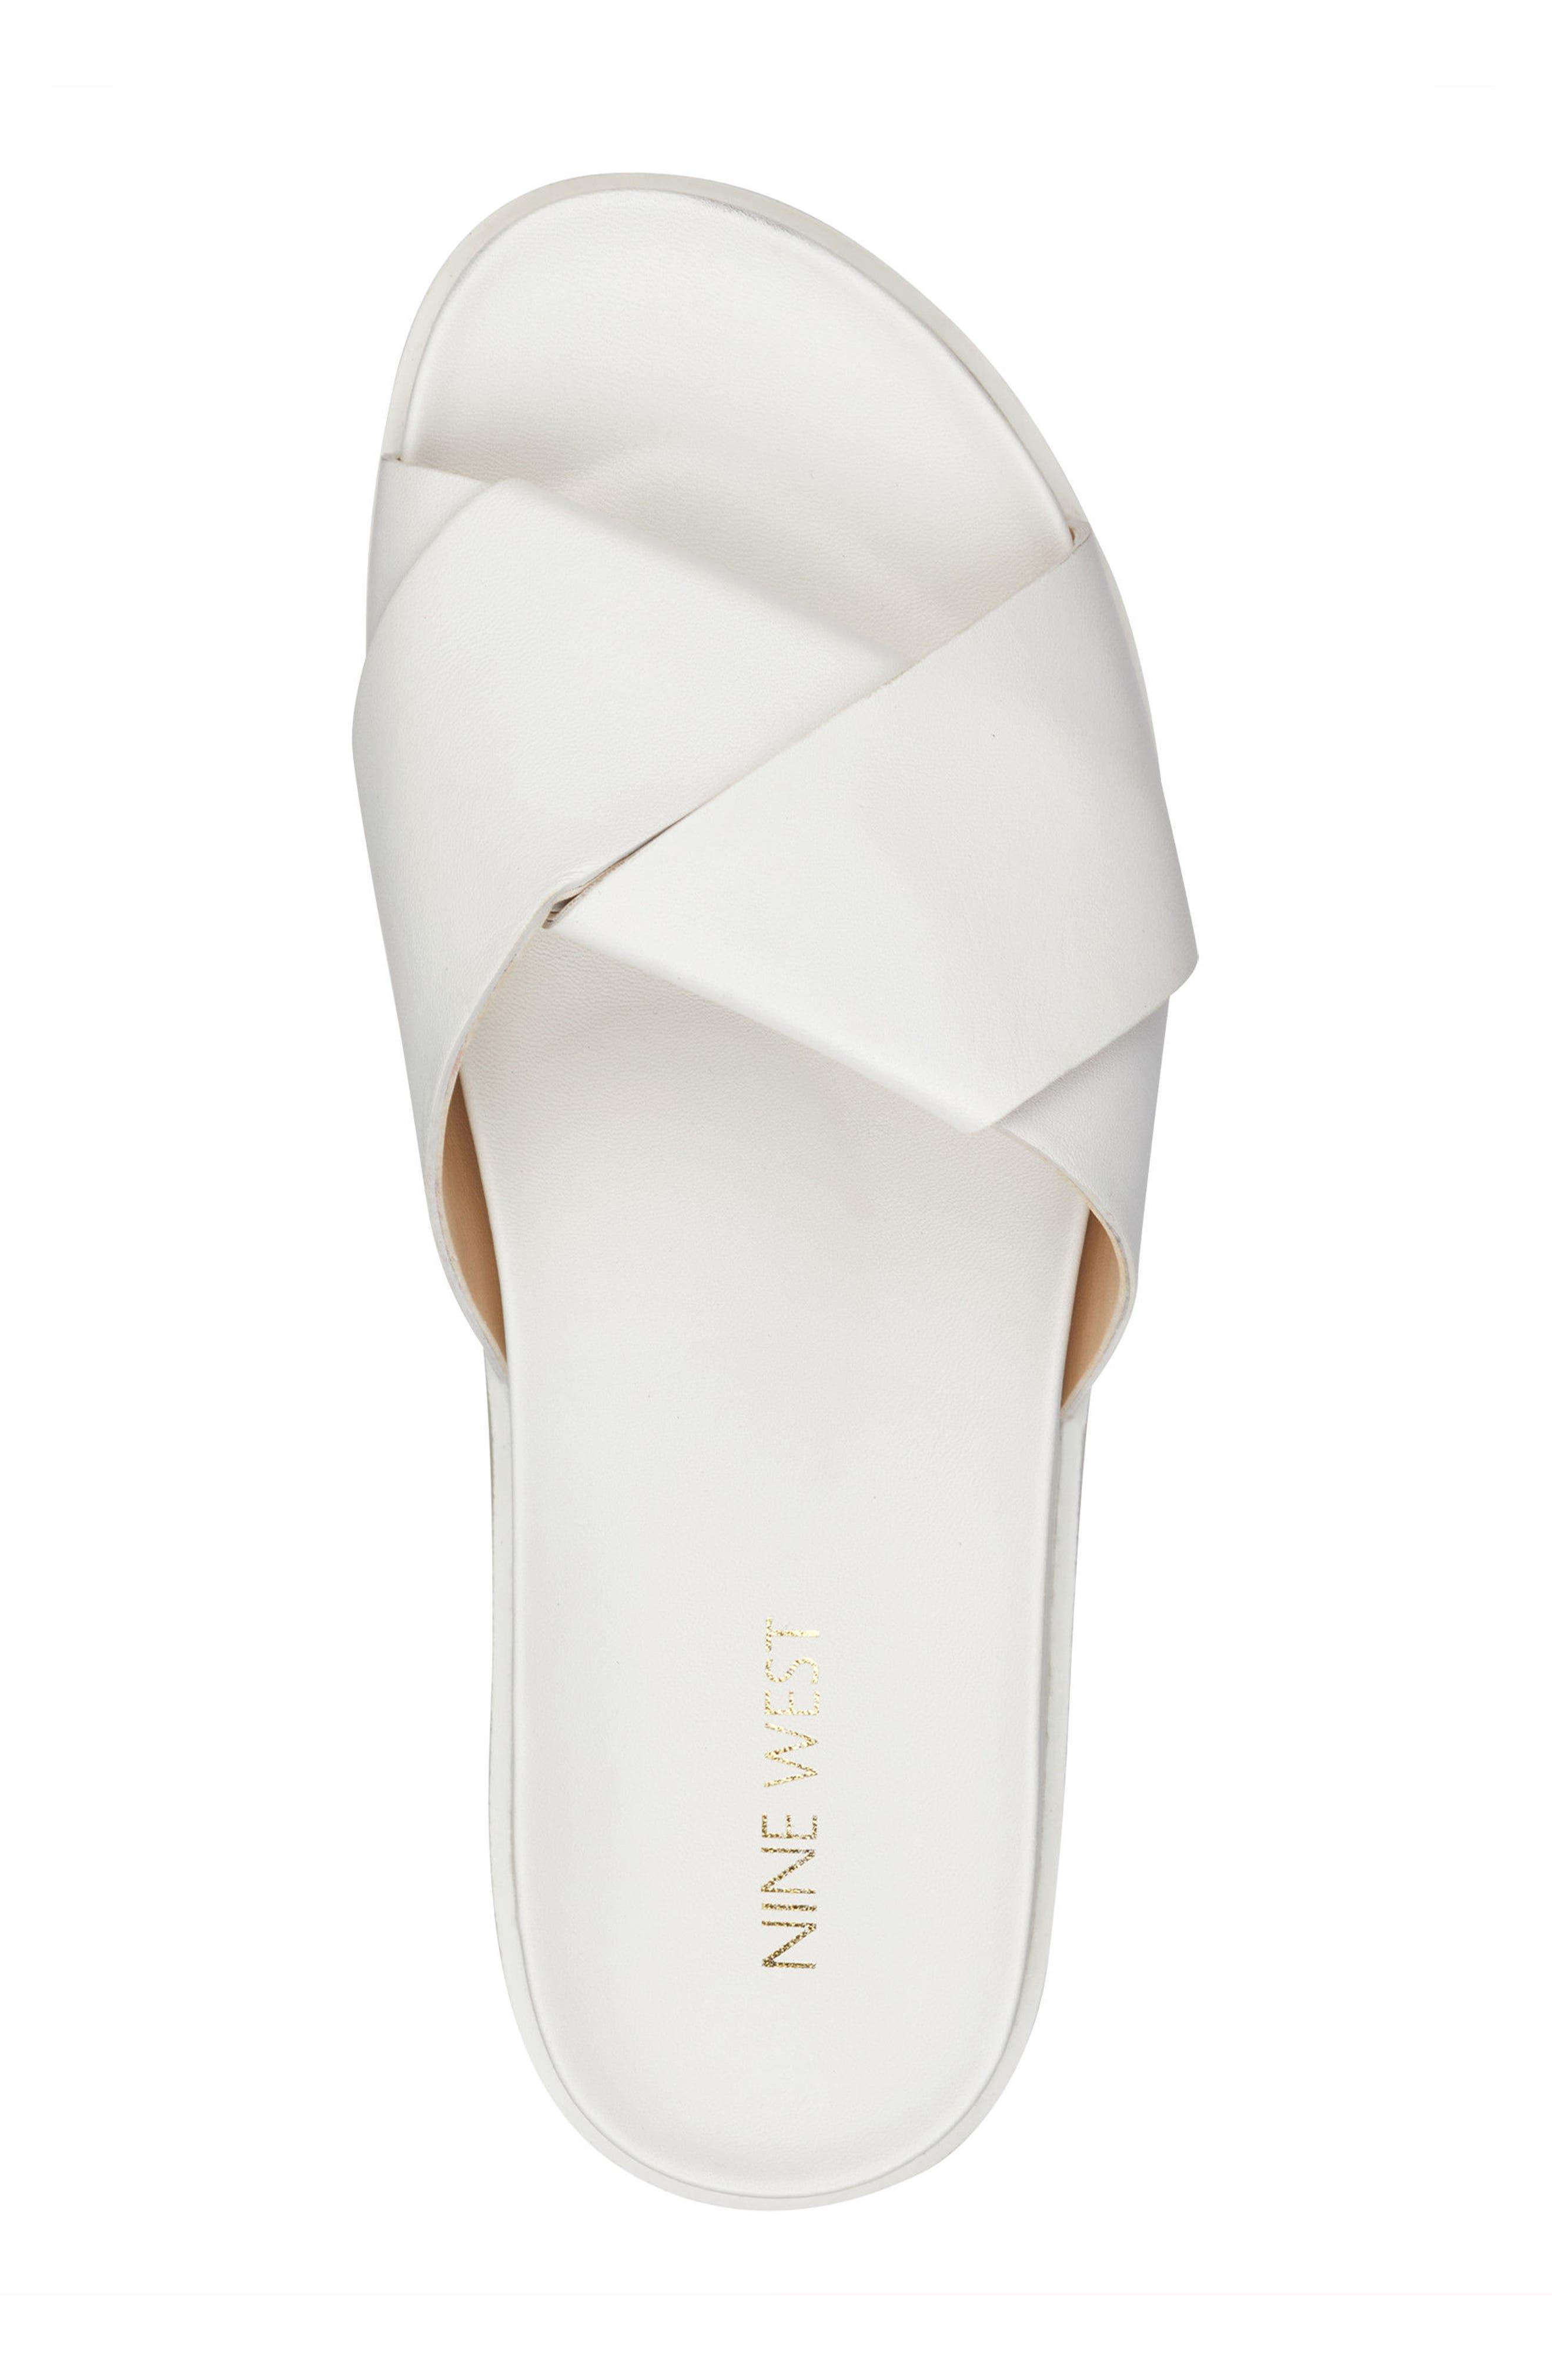 Furaish Slide Sandal,                             Alternate thumbnail 5, color,                             White Leather